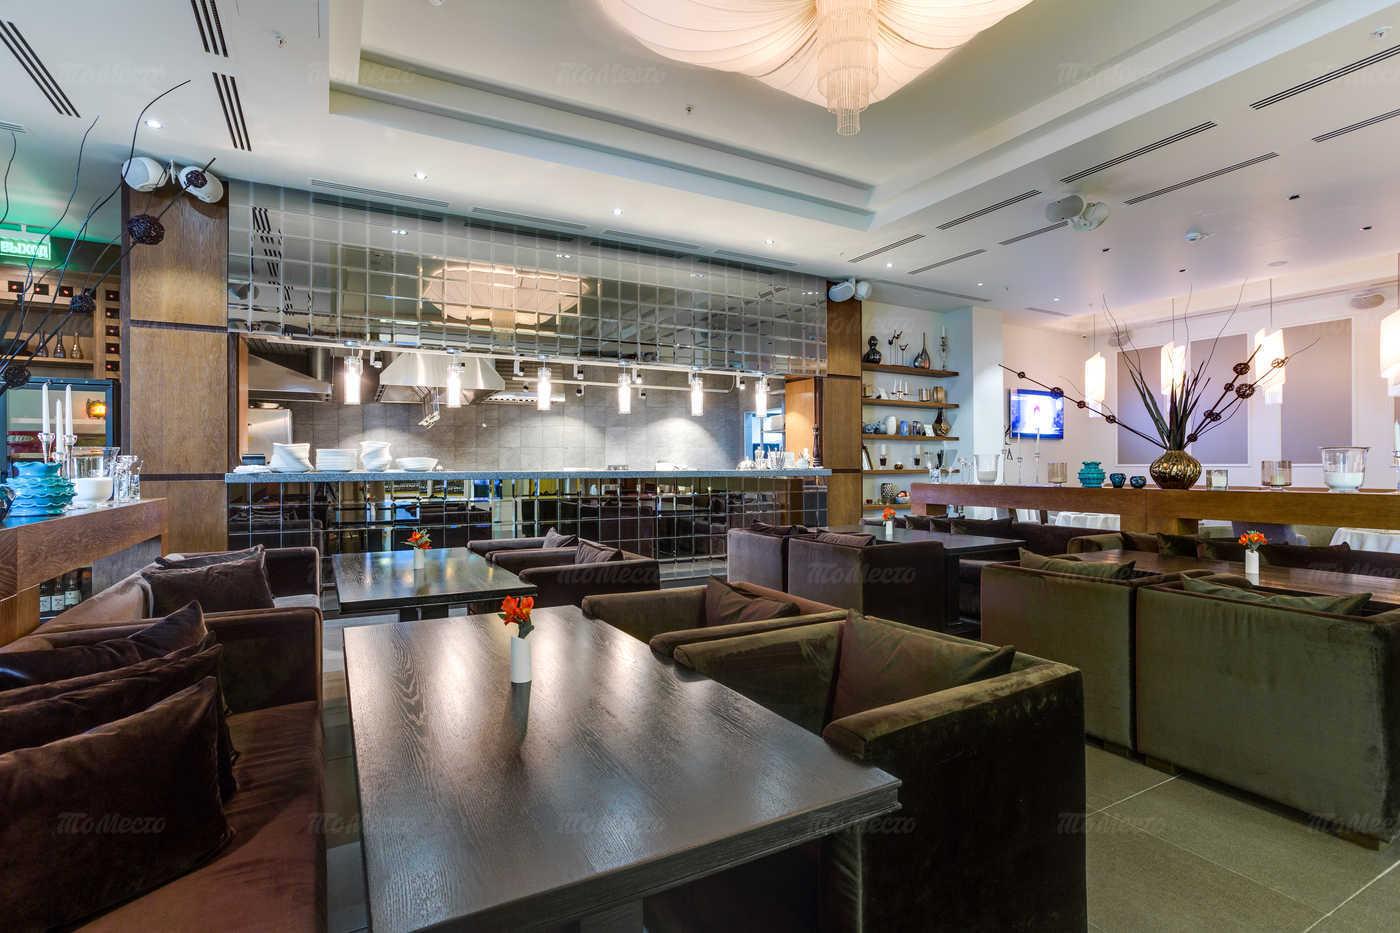 Меню кафе, ресторана Андиамо на Рублевском шоссе